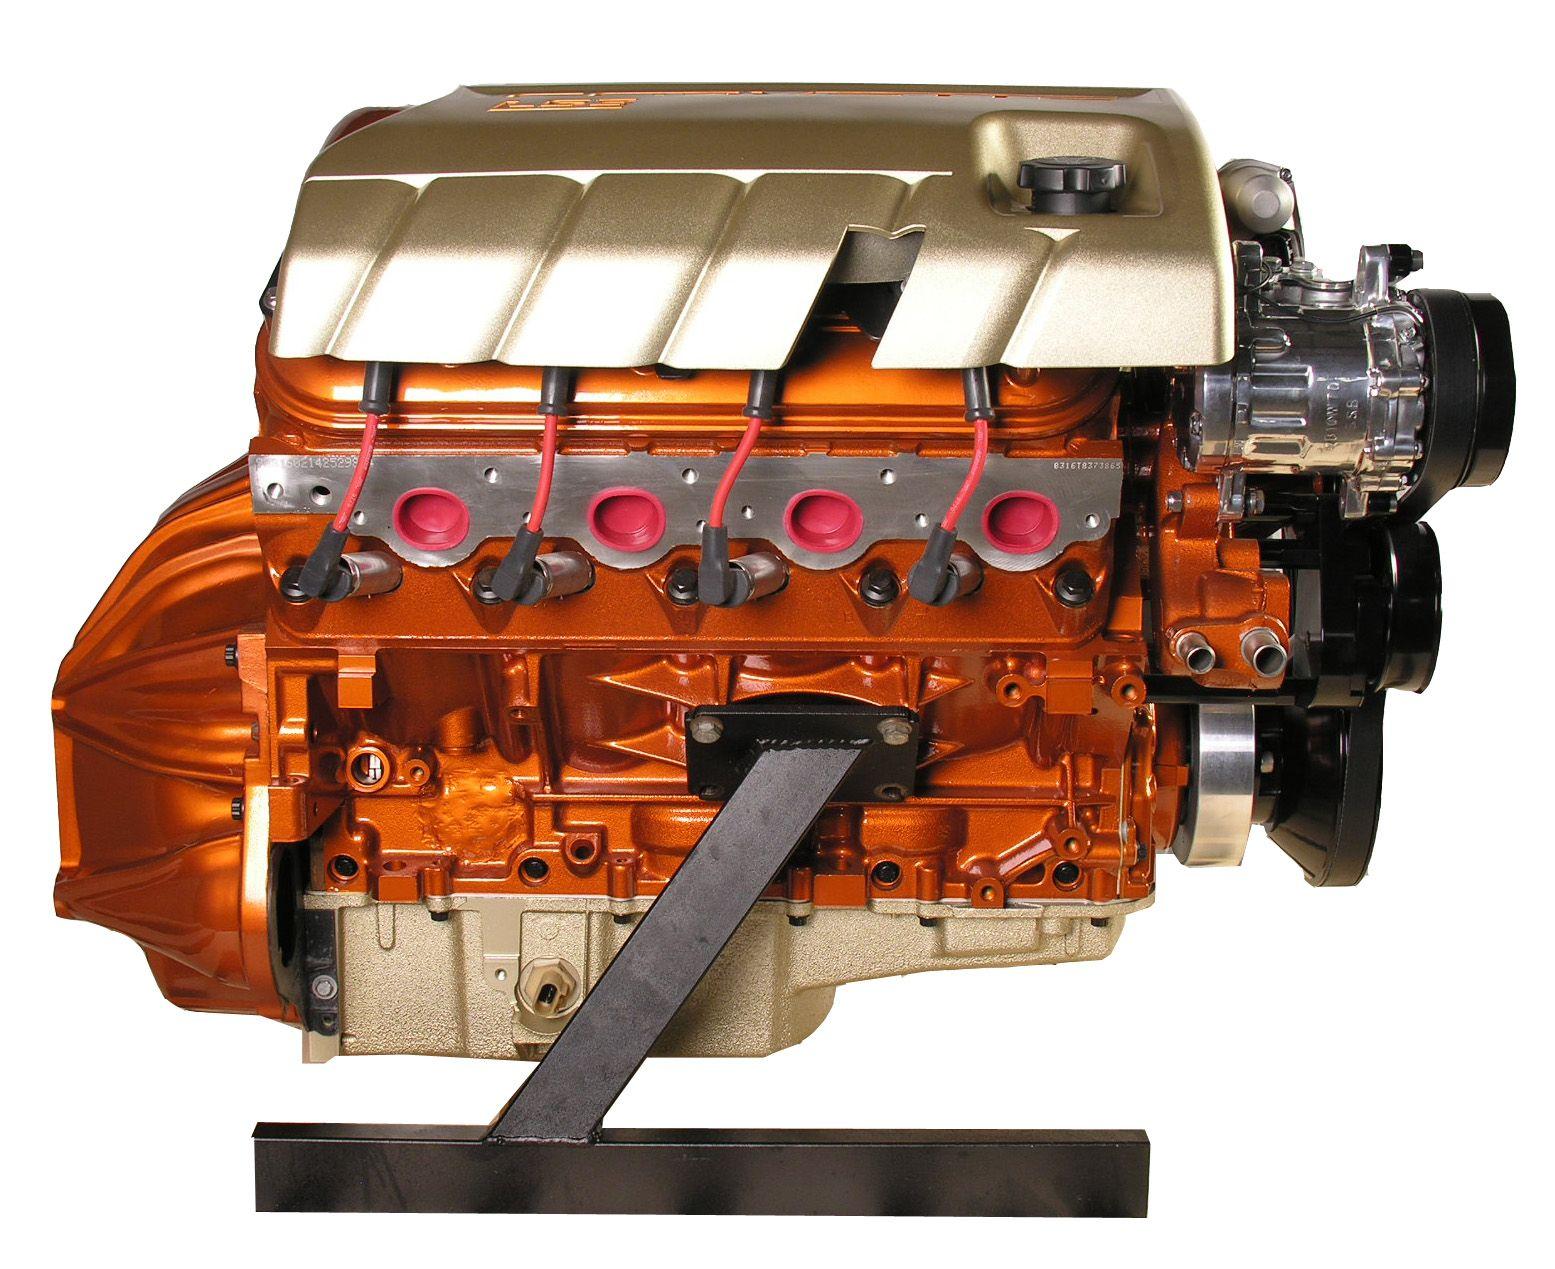 Ls3 Stage 2 Engine 480hp Burnt Orange Champagne Paints